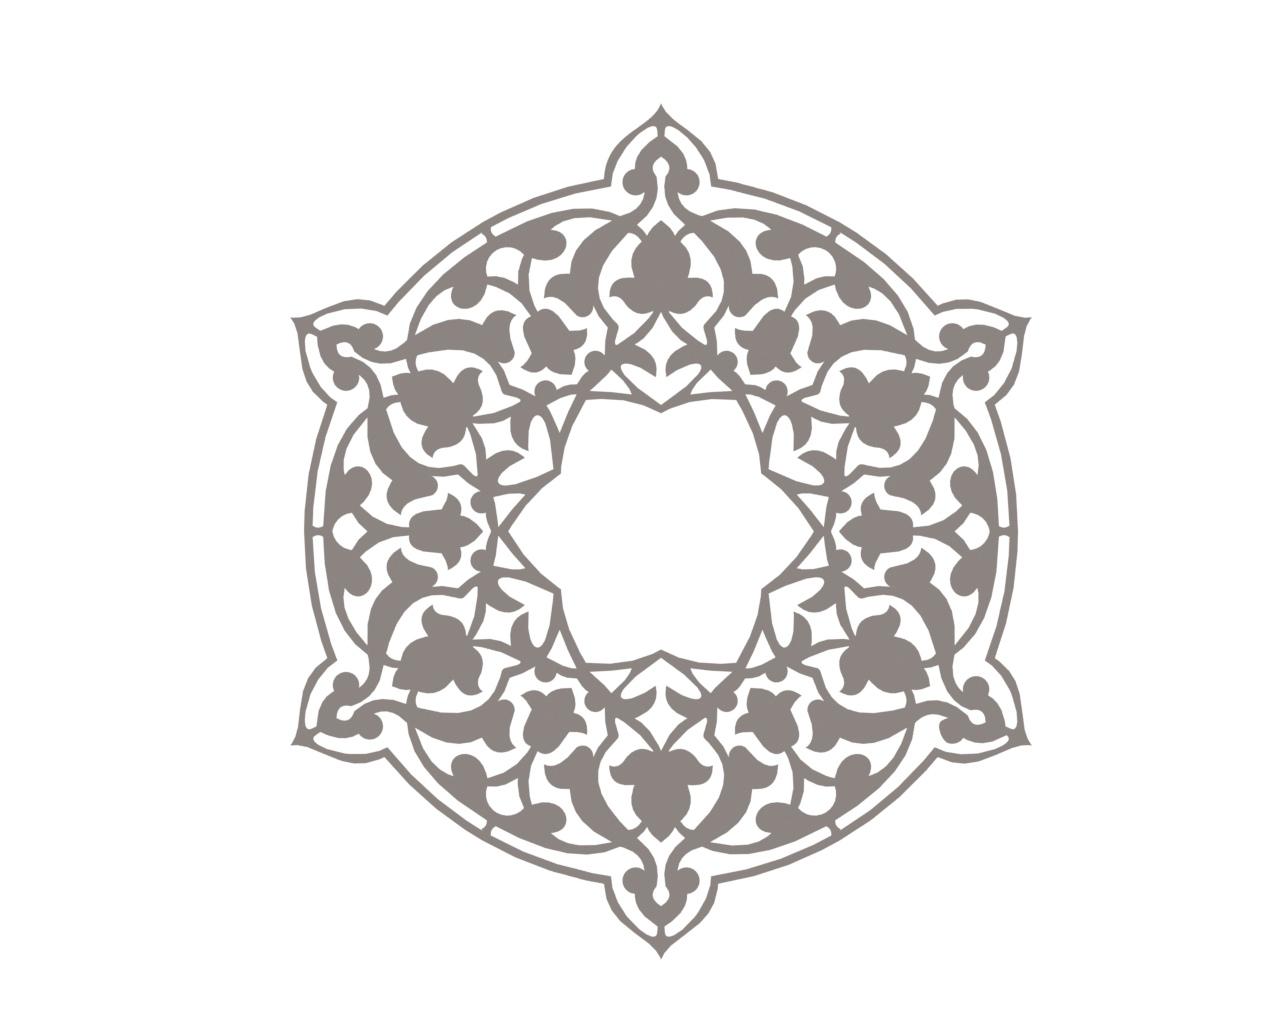 Circular Pattern In The Form Of A Mandala Ornament Free CDR Vectors Art